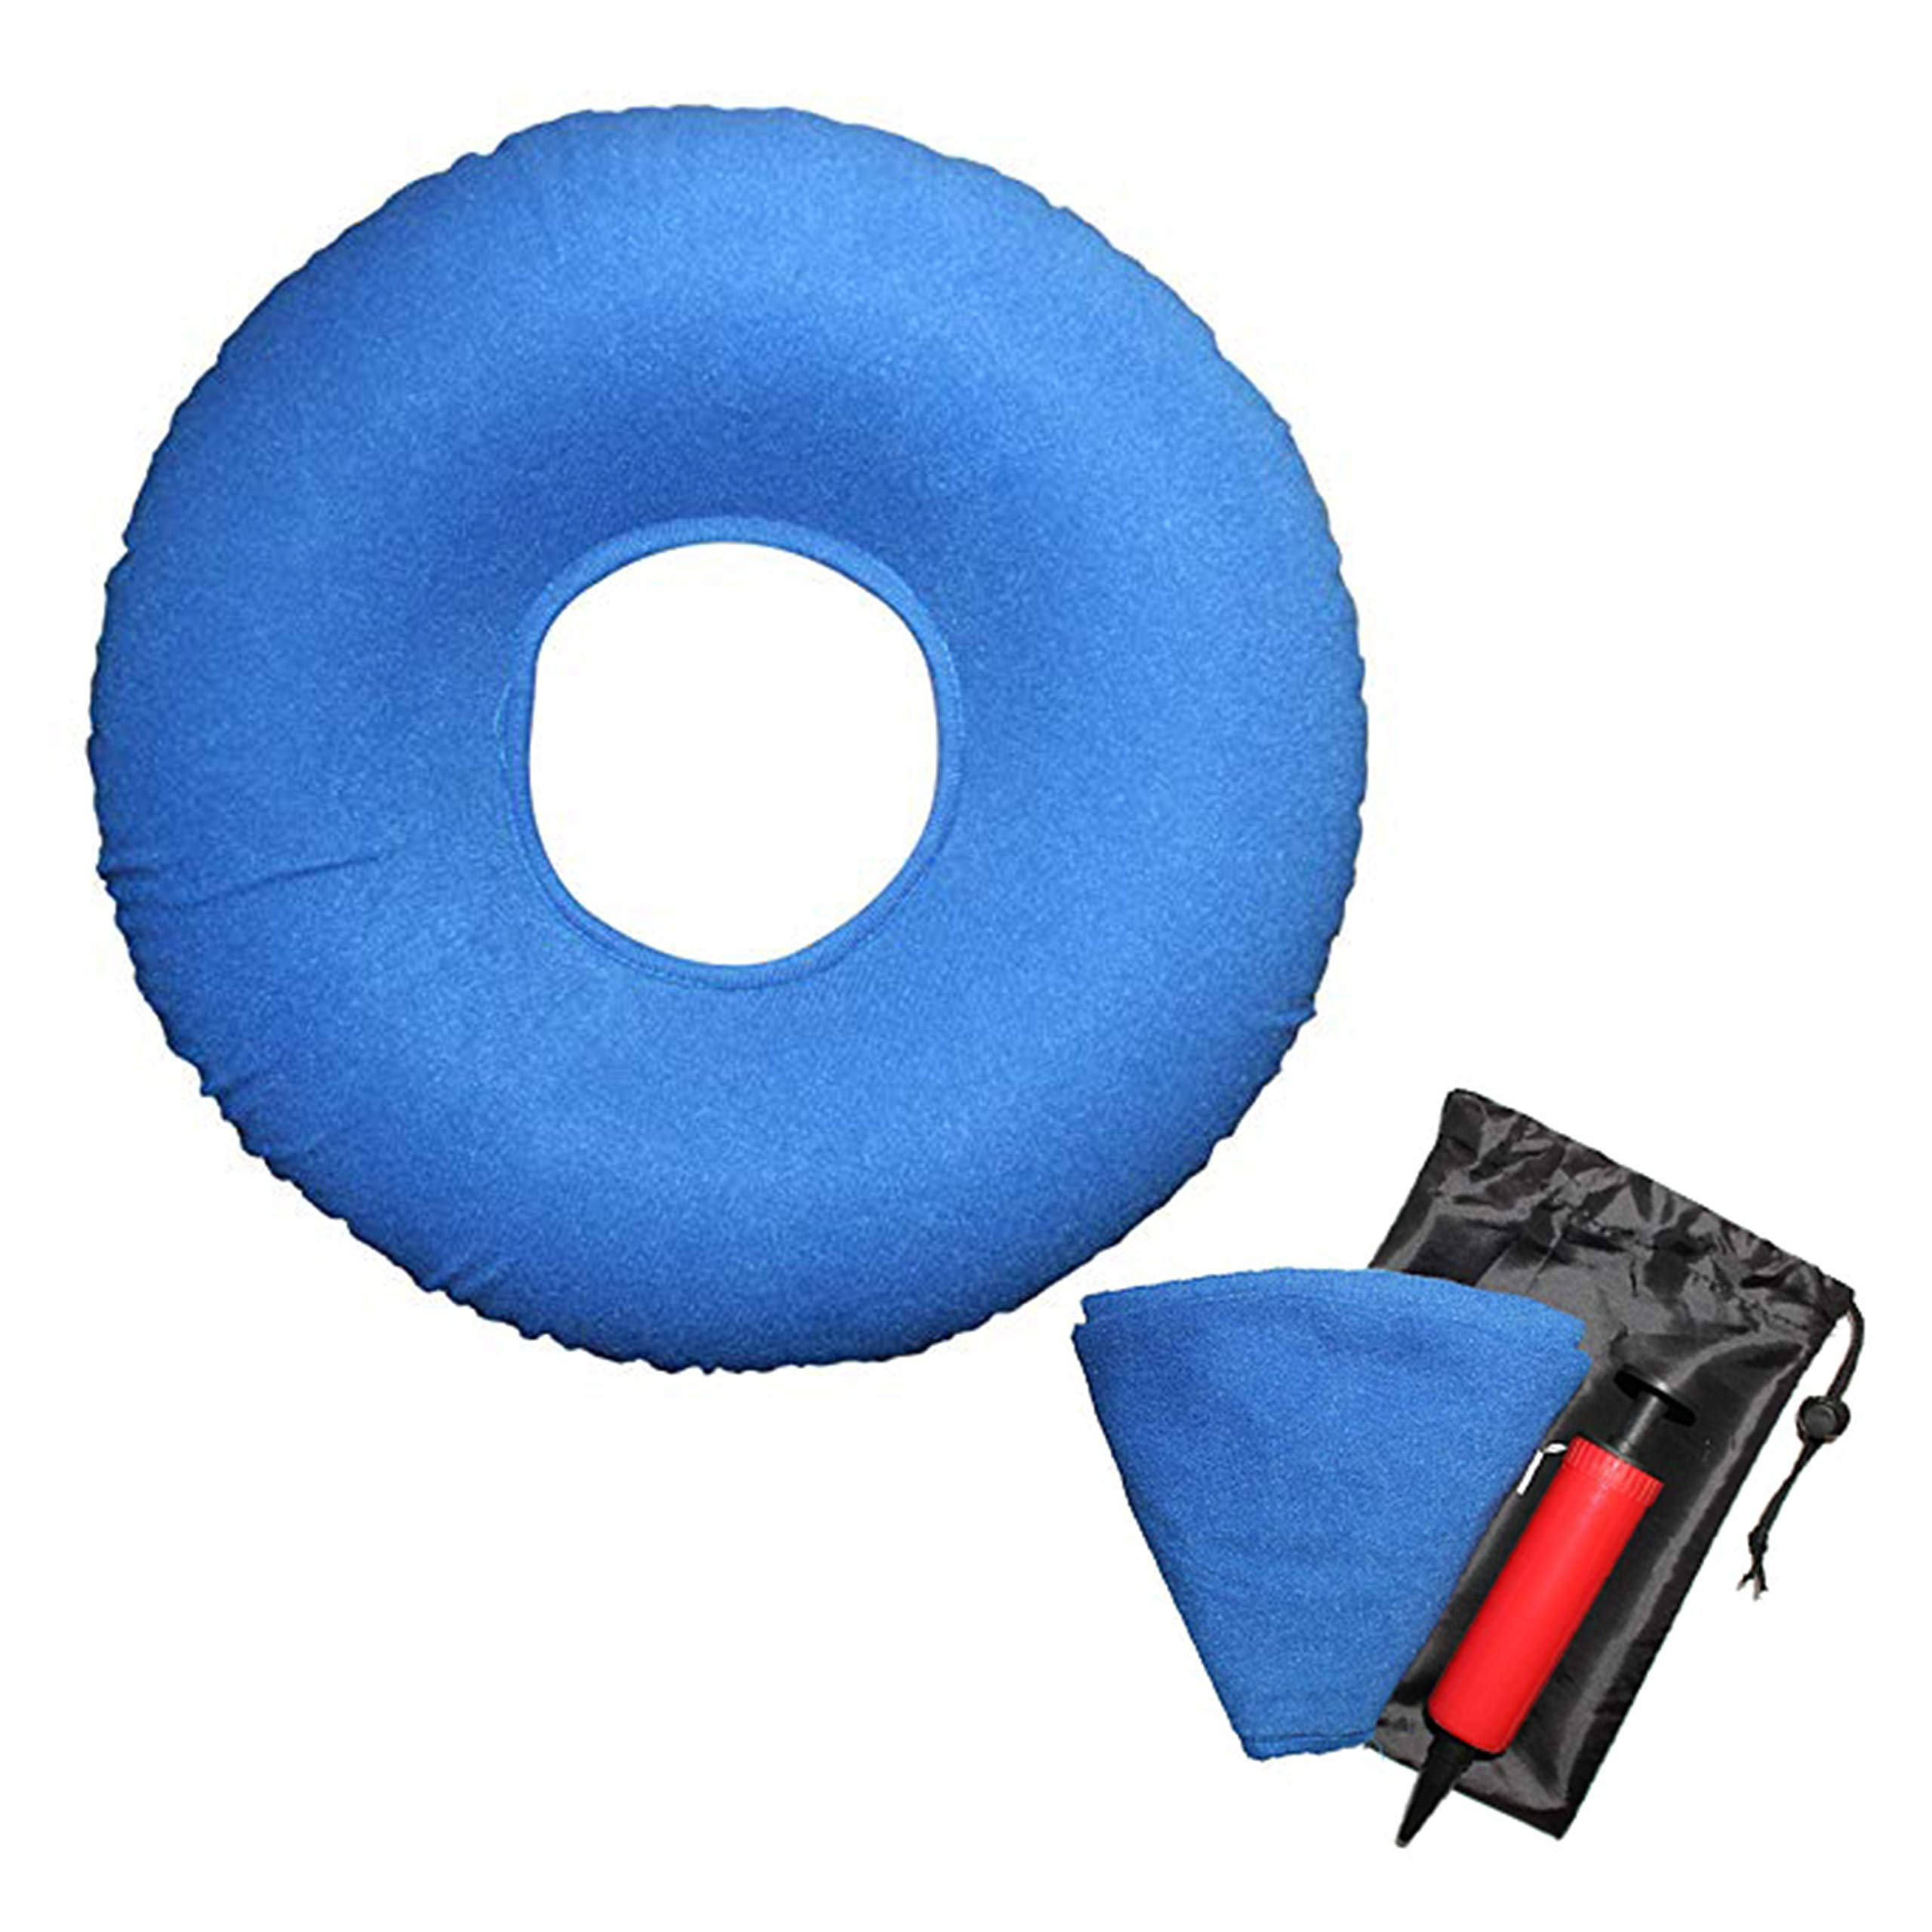 Carex Inflatable Donut Cushion For Tailbone Pain